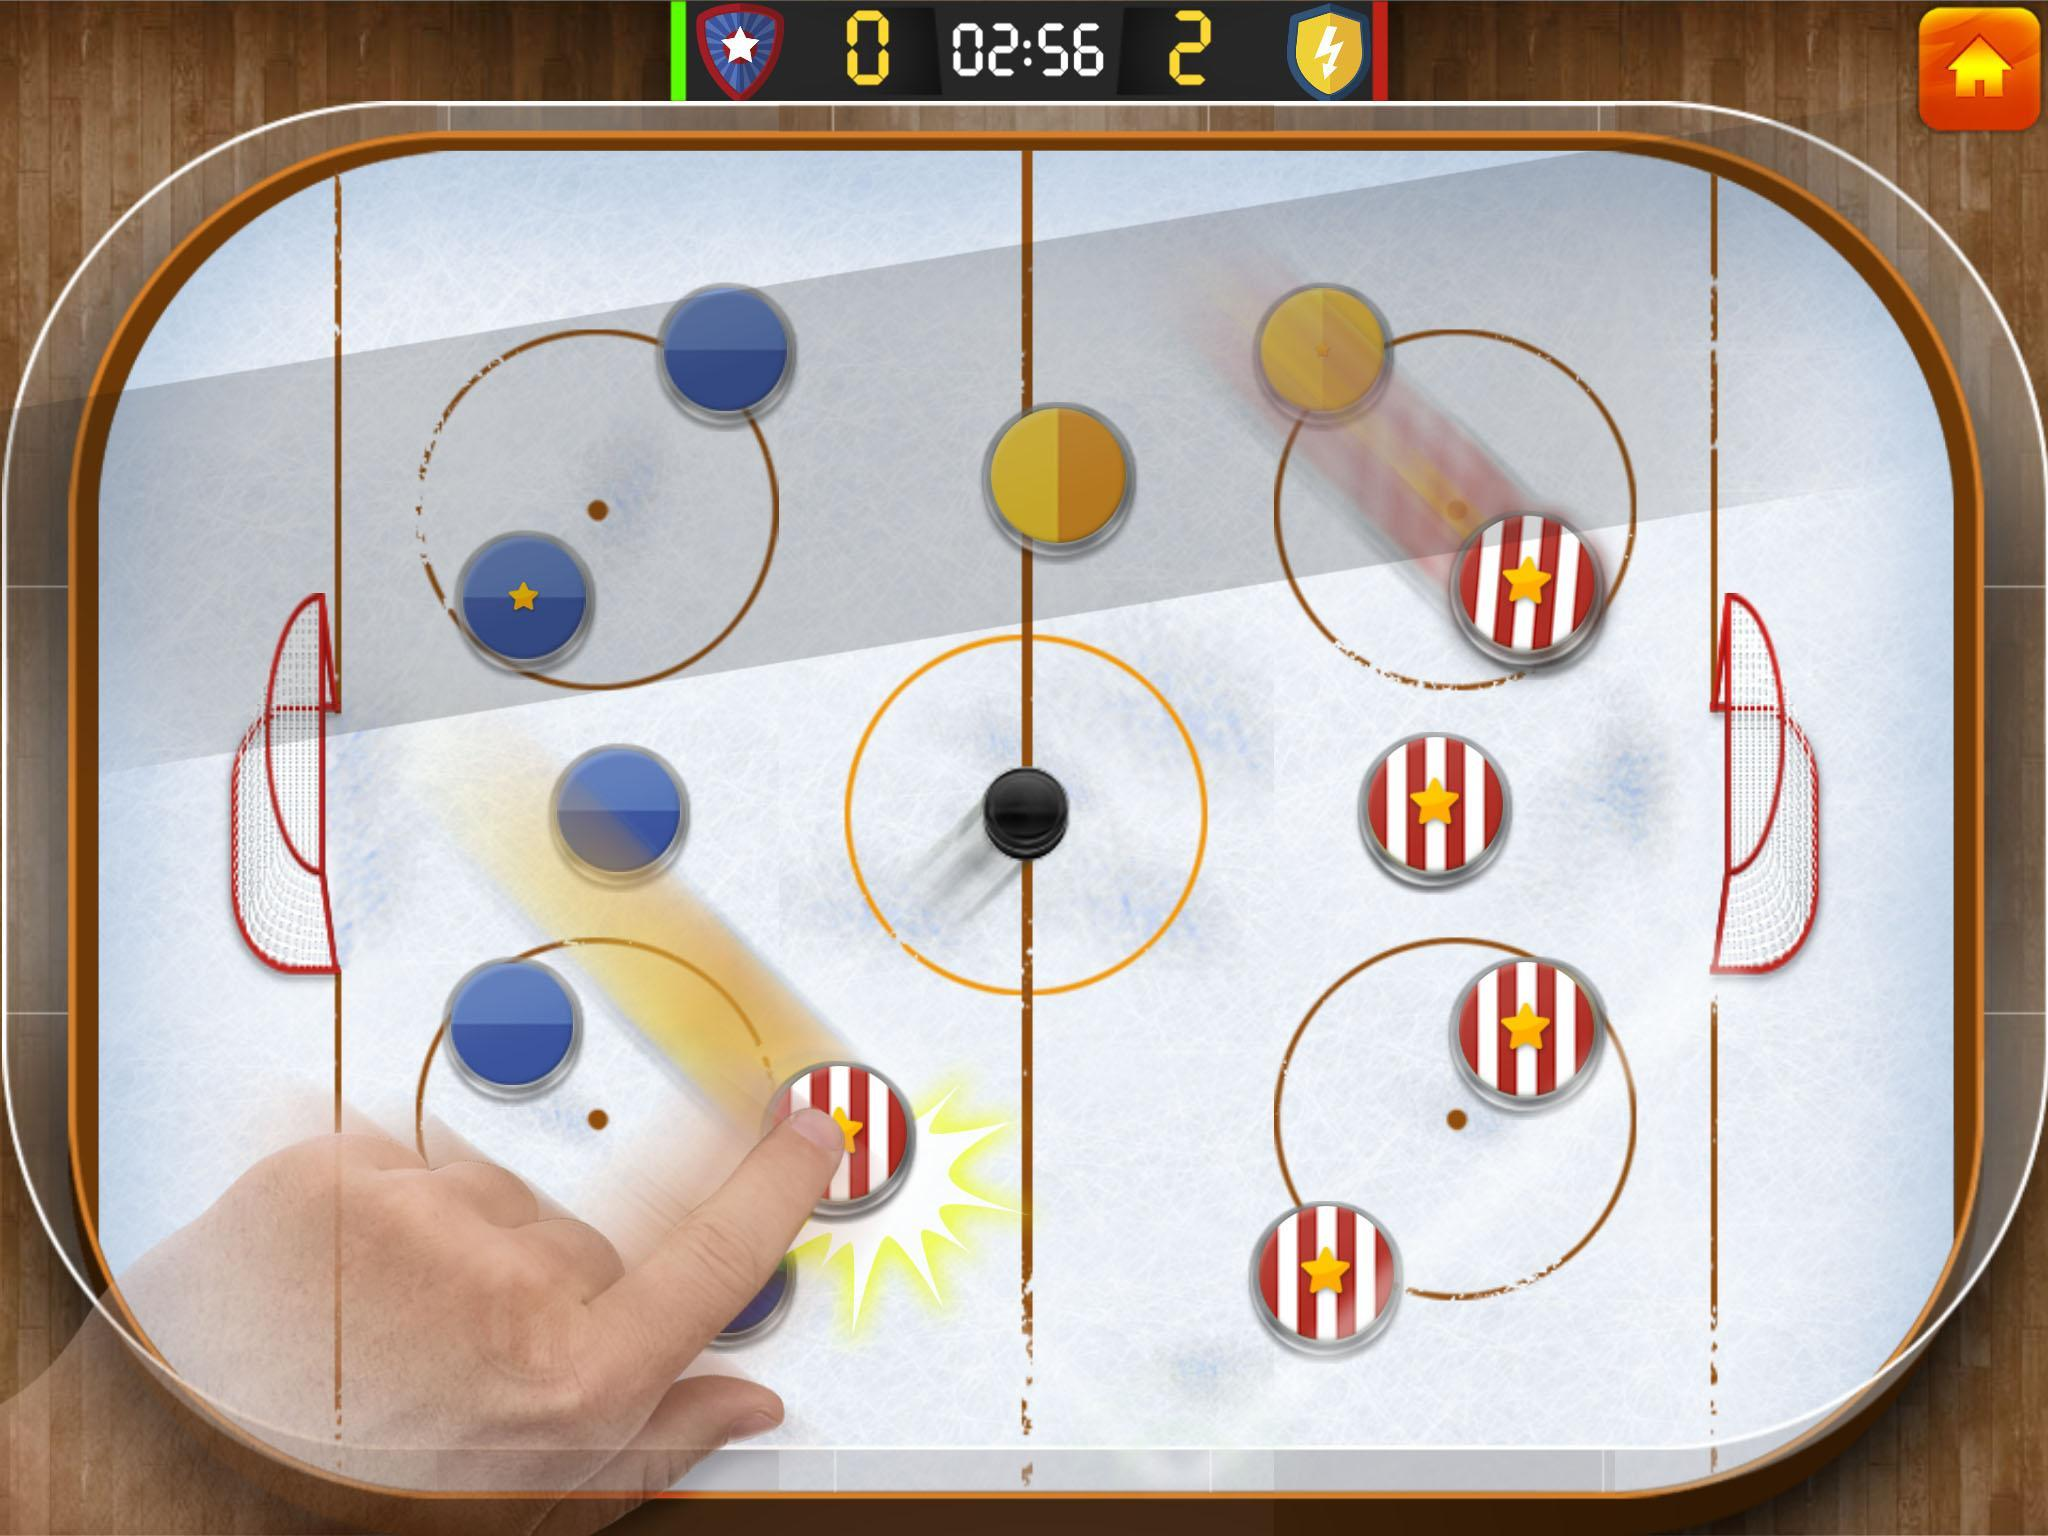 Ice Hockey League FREE 2.1 Screenshot 11